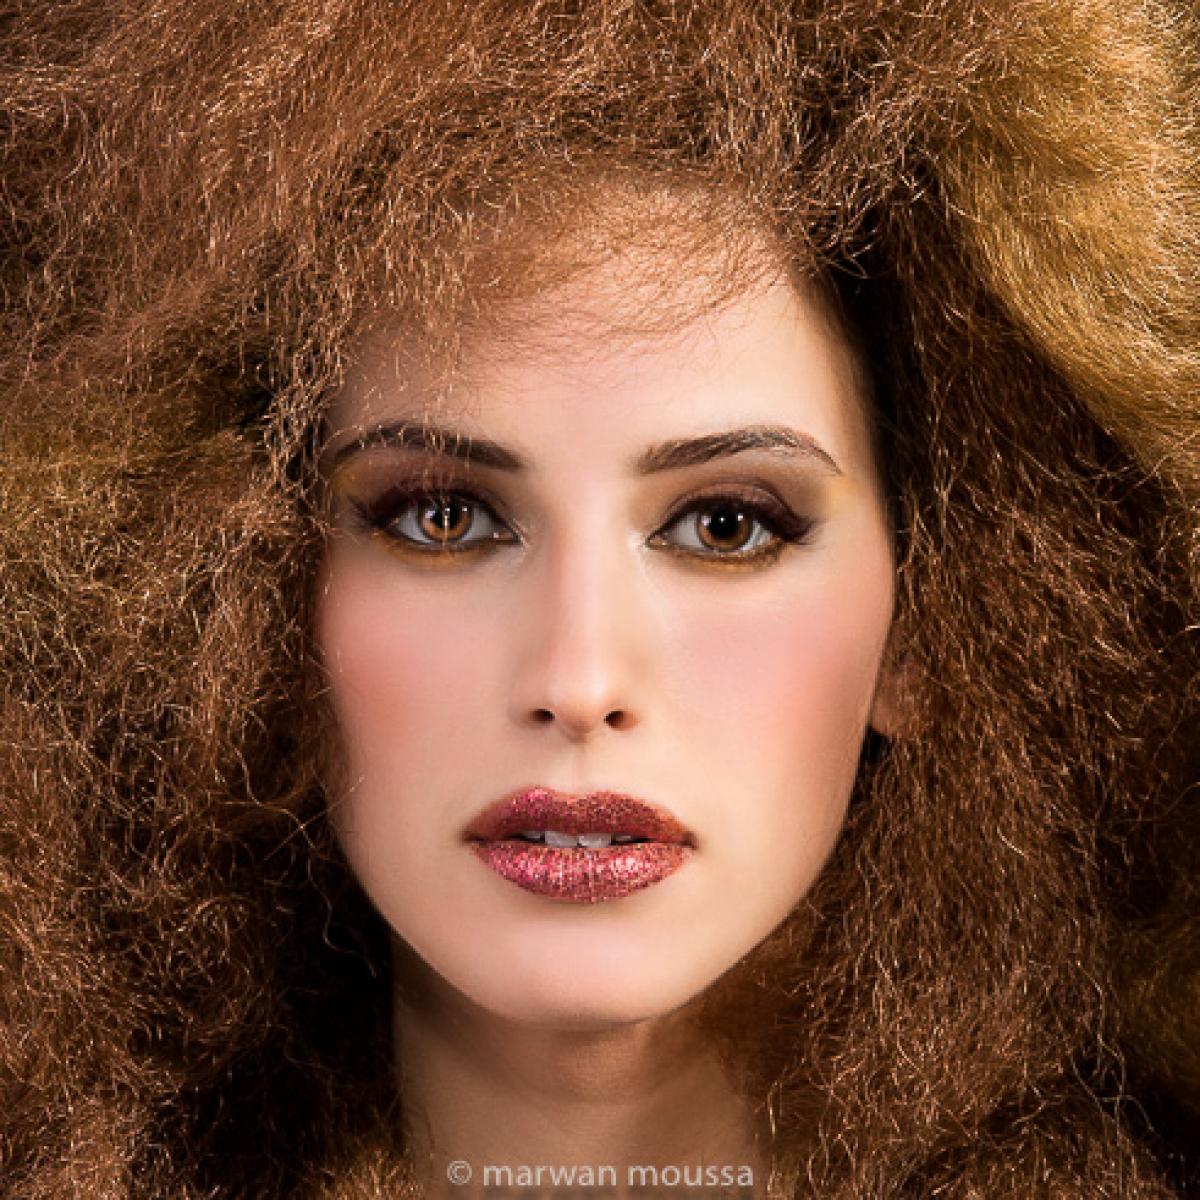 portrait, photographe, photographie, marwan moussa, coiffeur, coiffure, mariocoiffe, mario coiffe, lightroom, frank provost, studio, femme, make-up